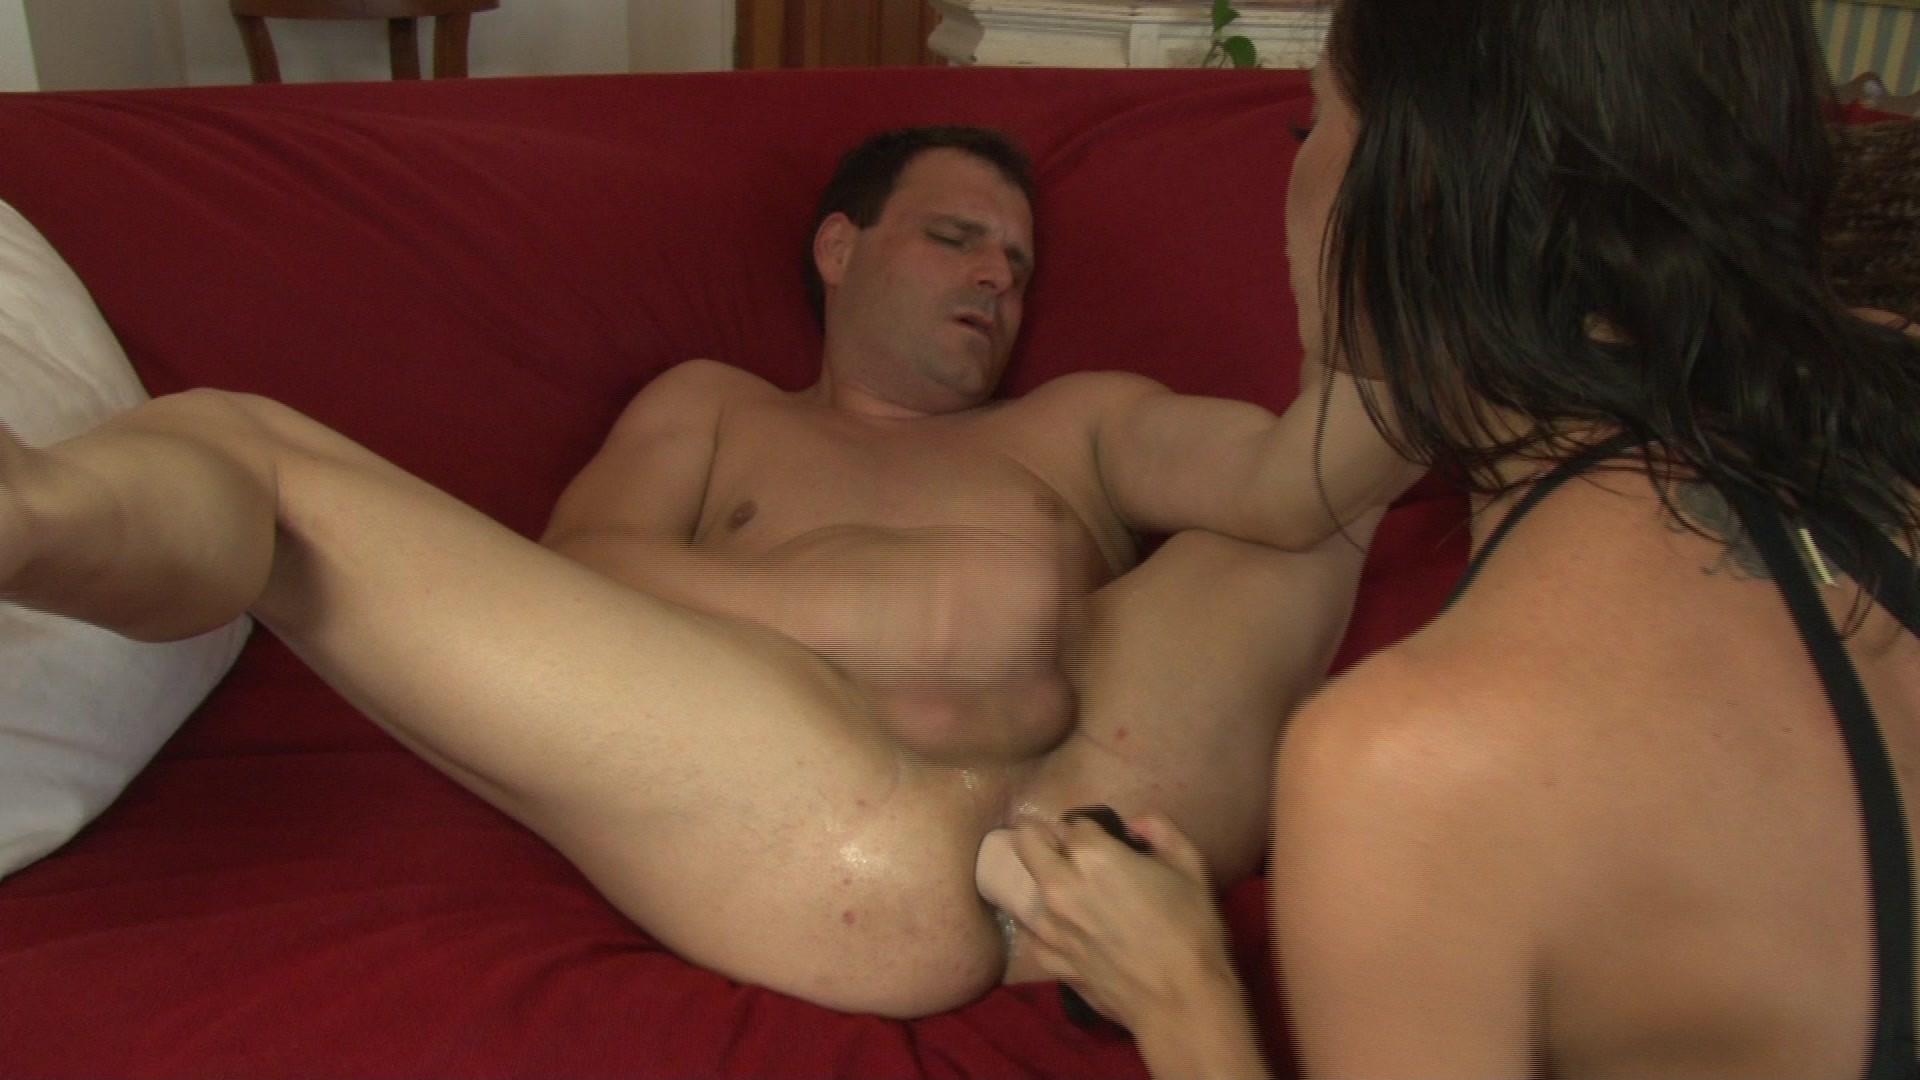 Hot Nude Photos Sensual male sex organ